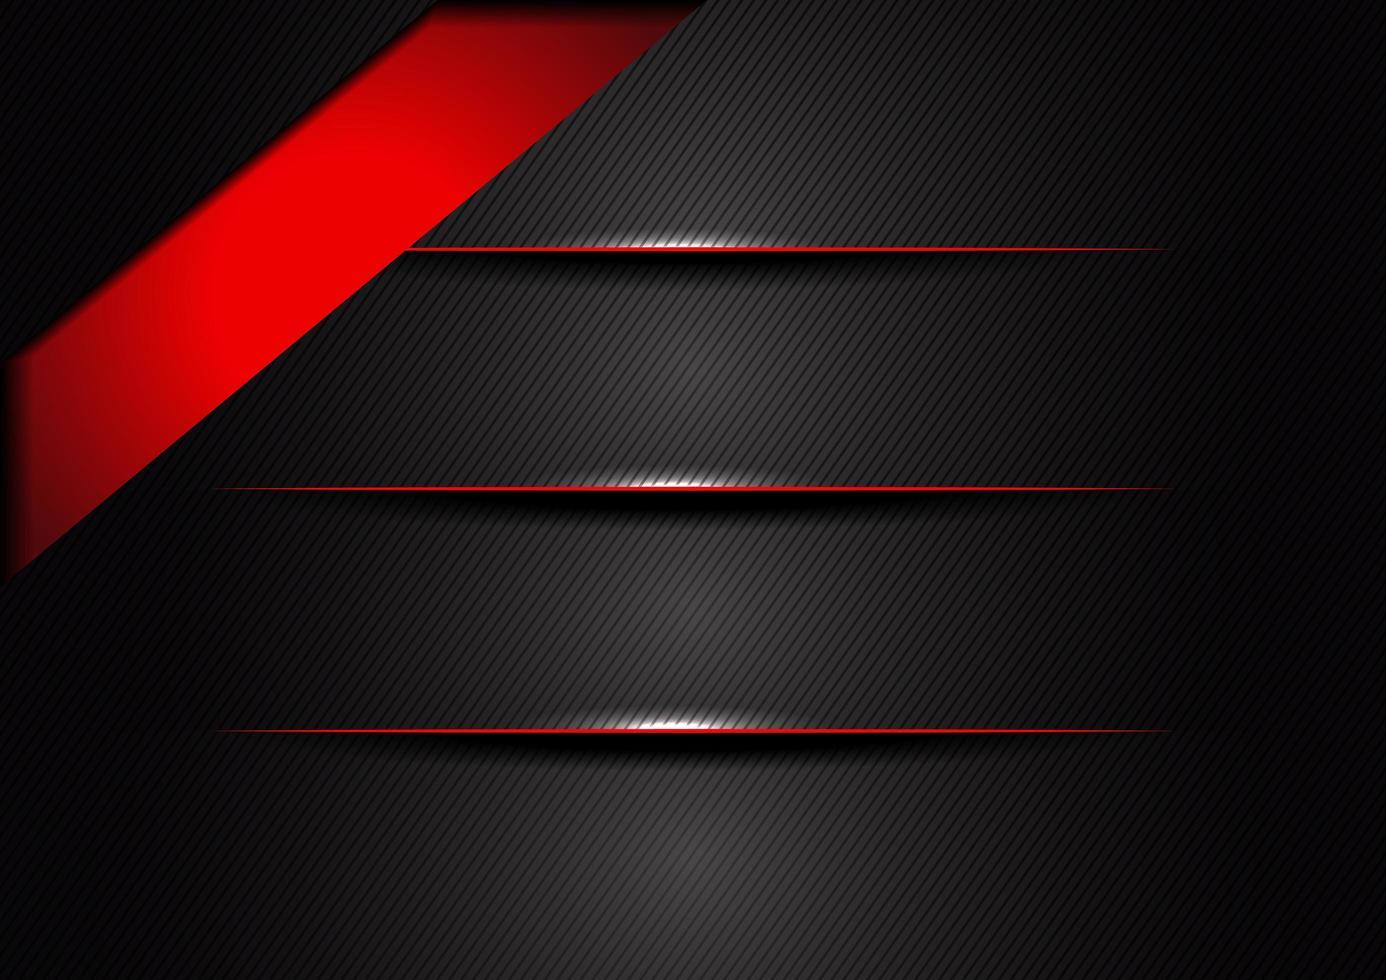 Capas de degradado abstracto negro, rojo, gris con bordes vector